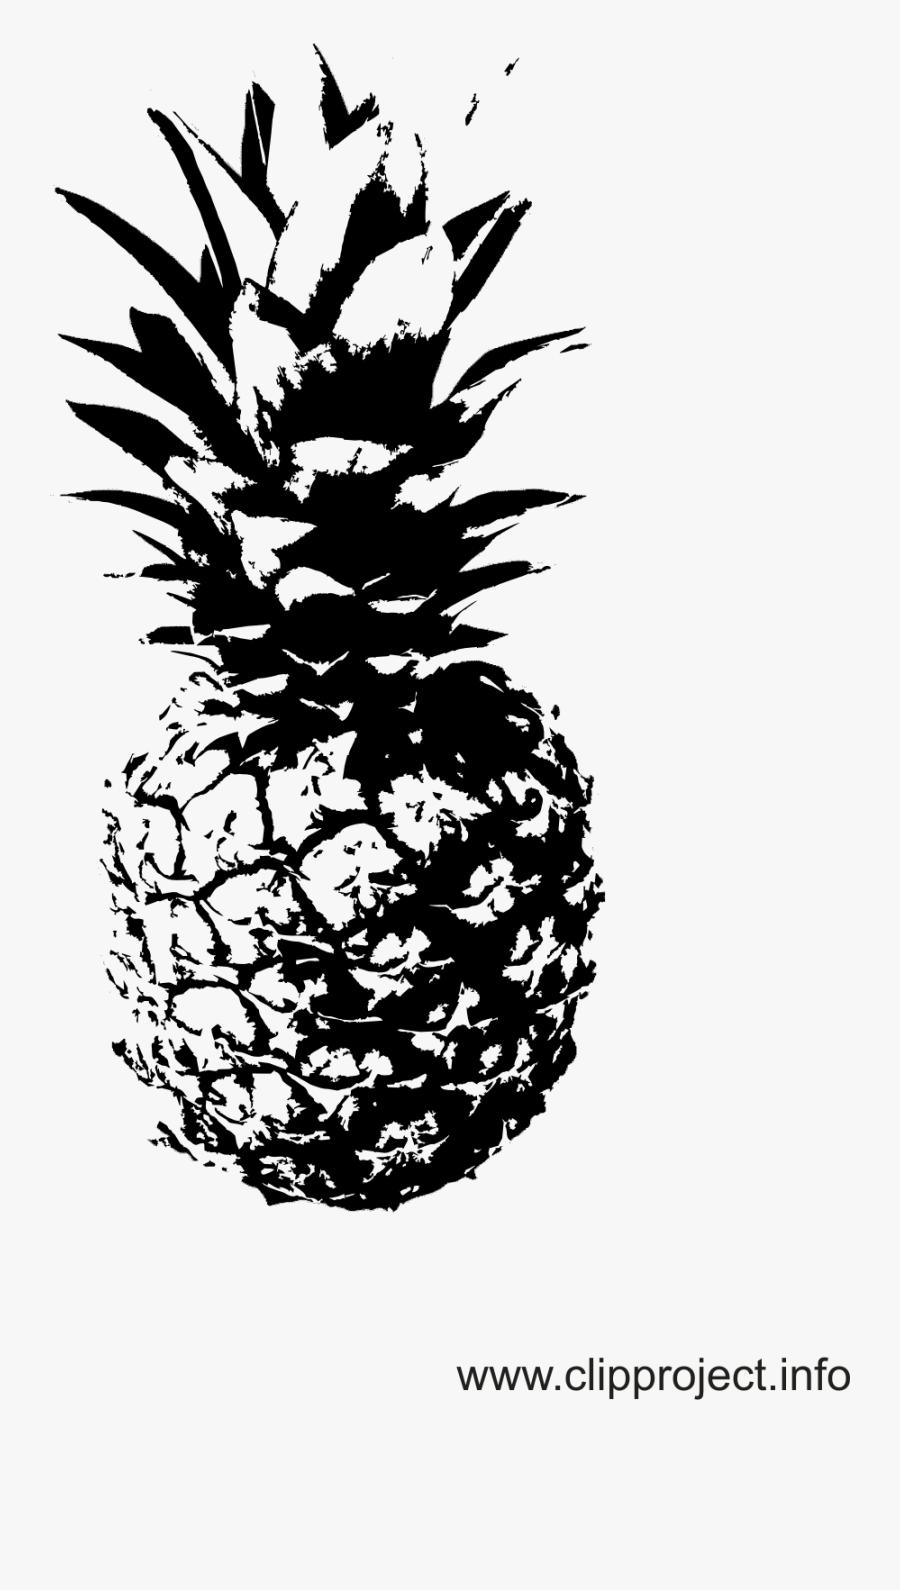 Drawing Geometry Pineapple - Schwarz Weiß Bilder Ananas, Transparent Clipart